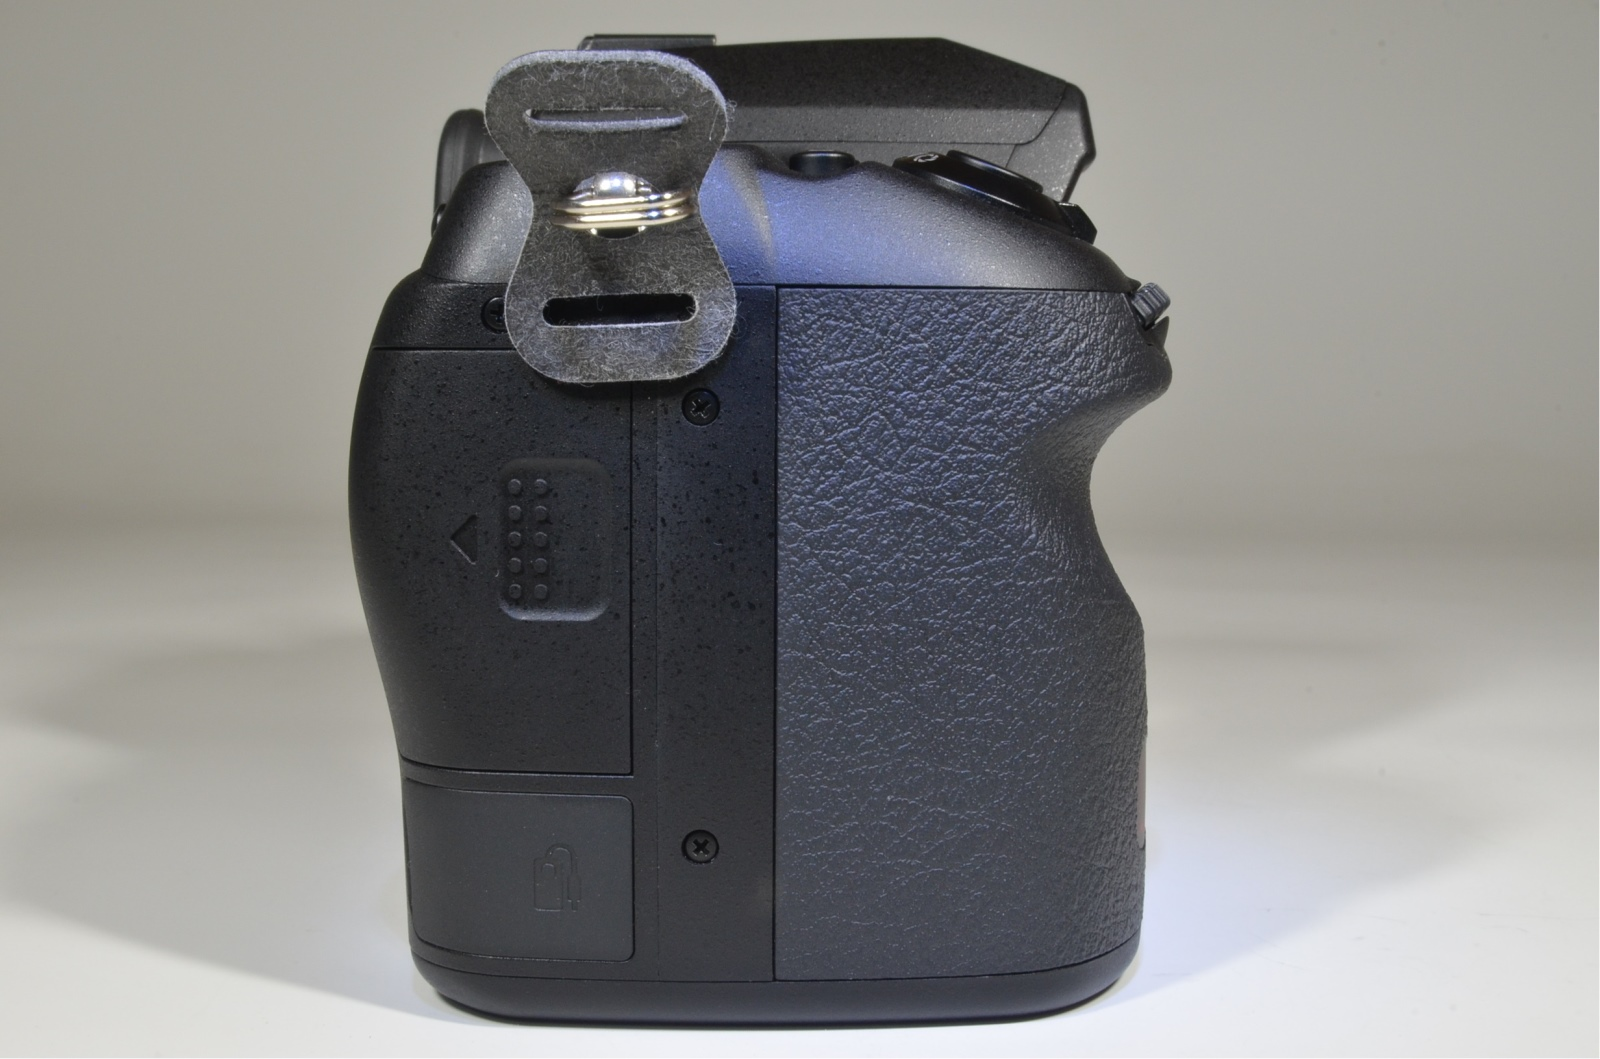 pentax k-5 ii with da 18-135mm f/3.5-5.6 ed al wr